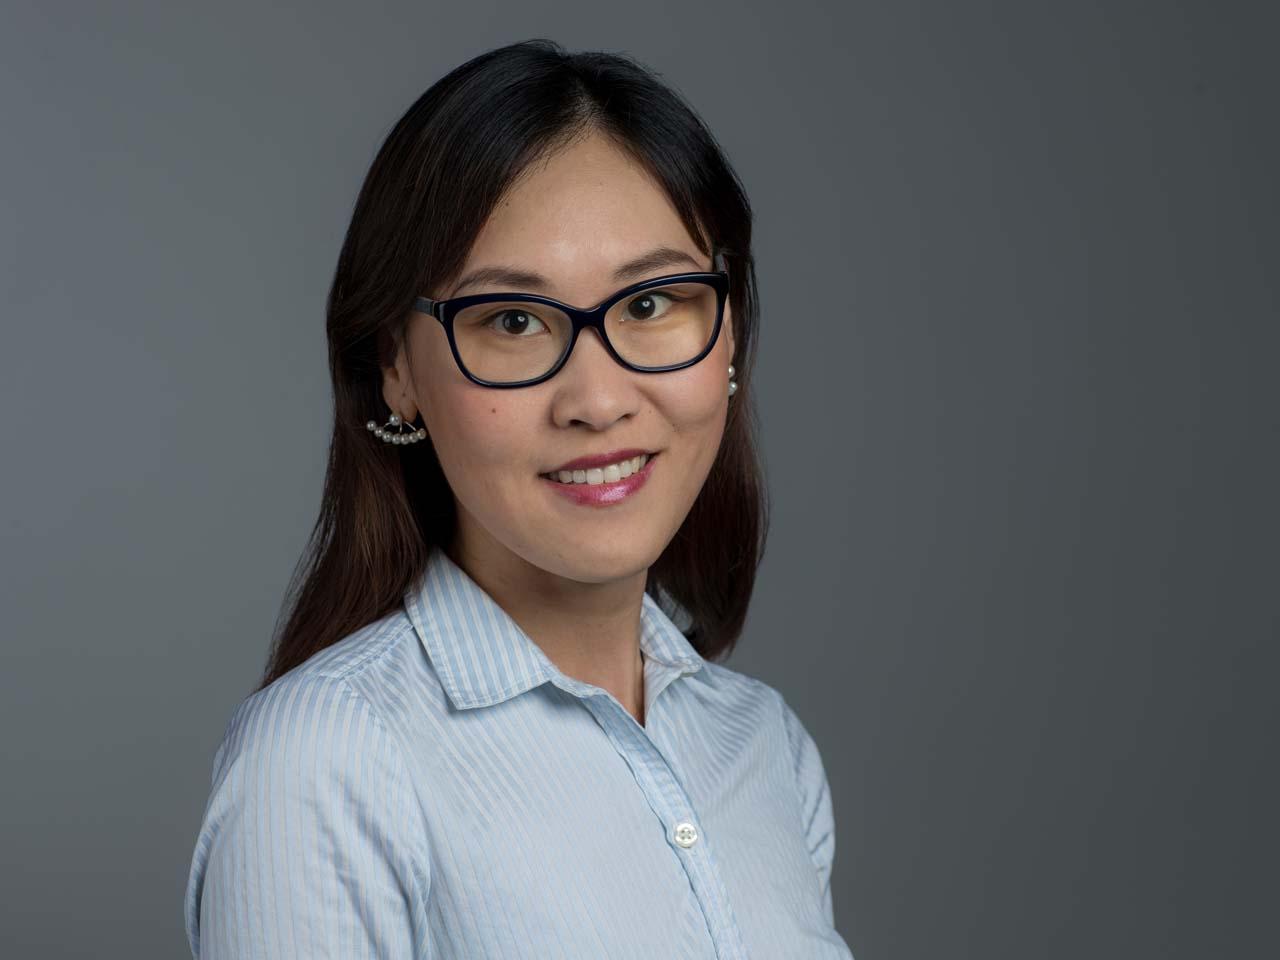 Kefei Wang